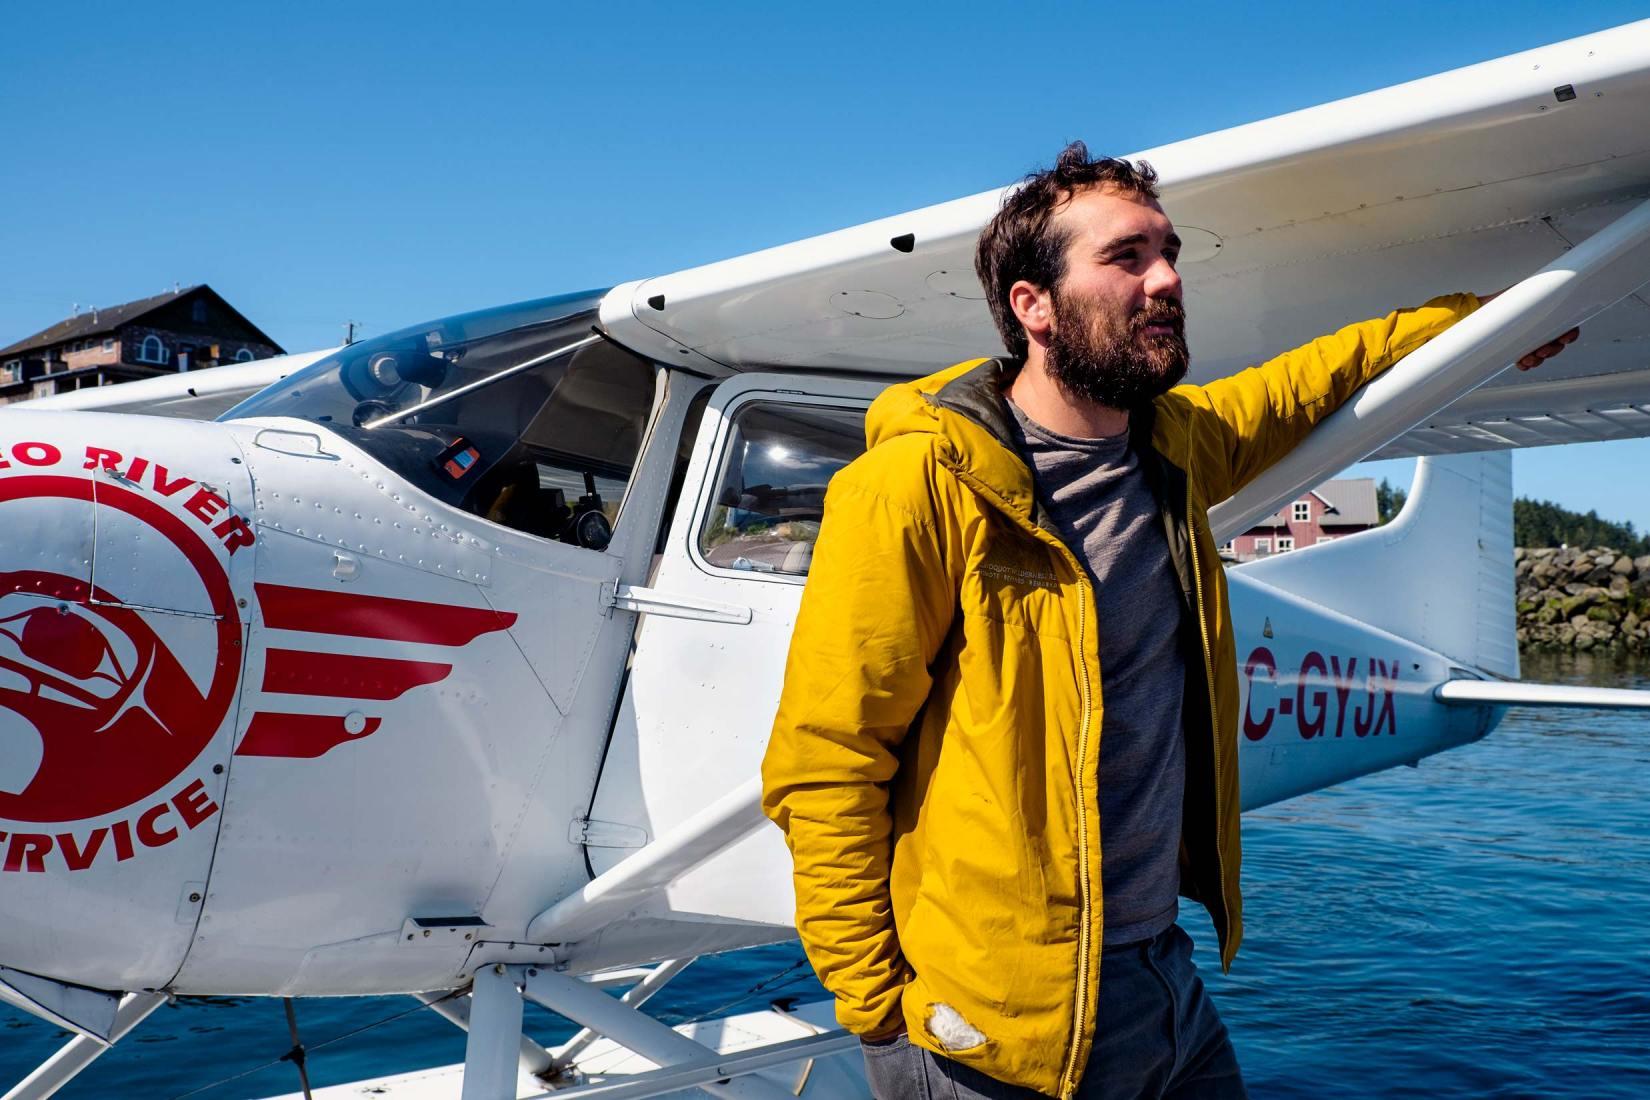 PWS015-0596-Sharon-Blance-photographer-Tofino-travel-editorial-float-sea-plant-atleo-air-pilot